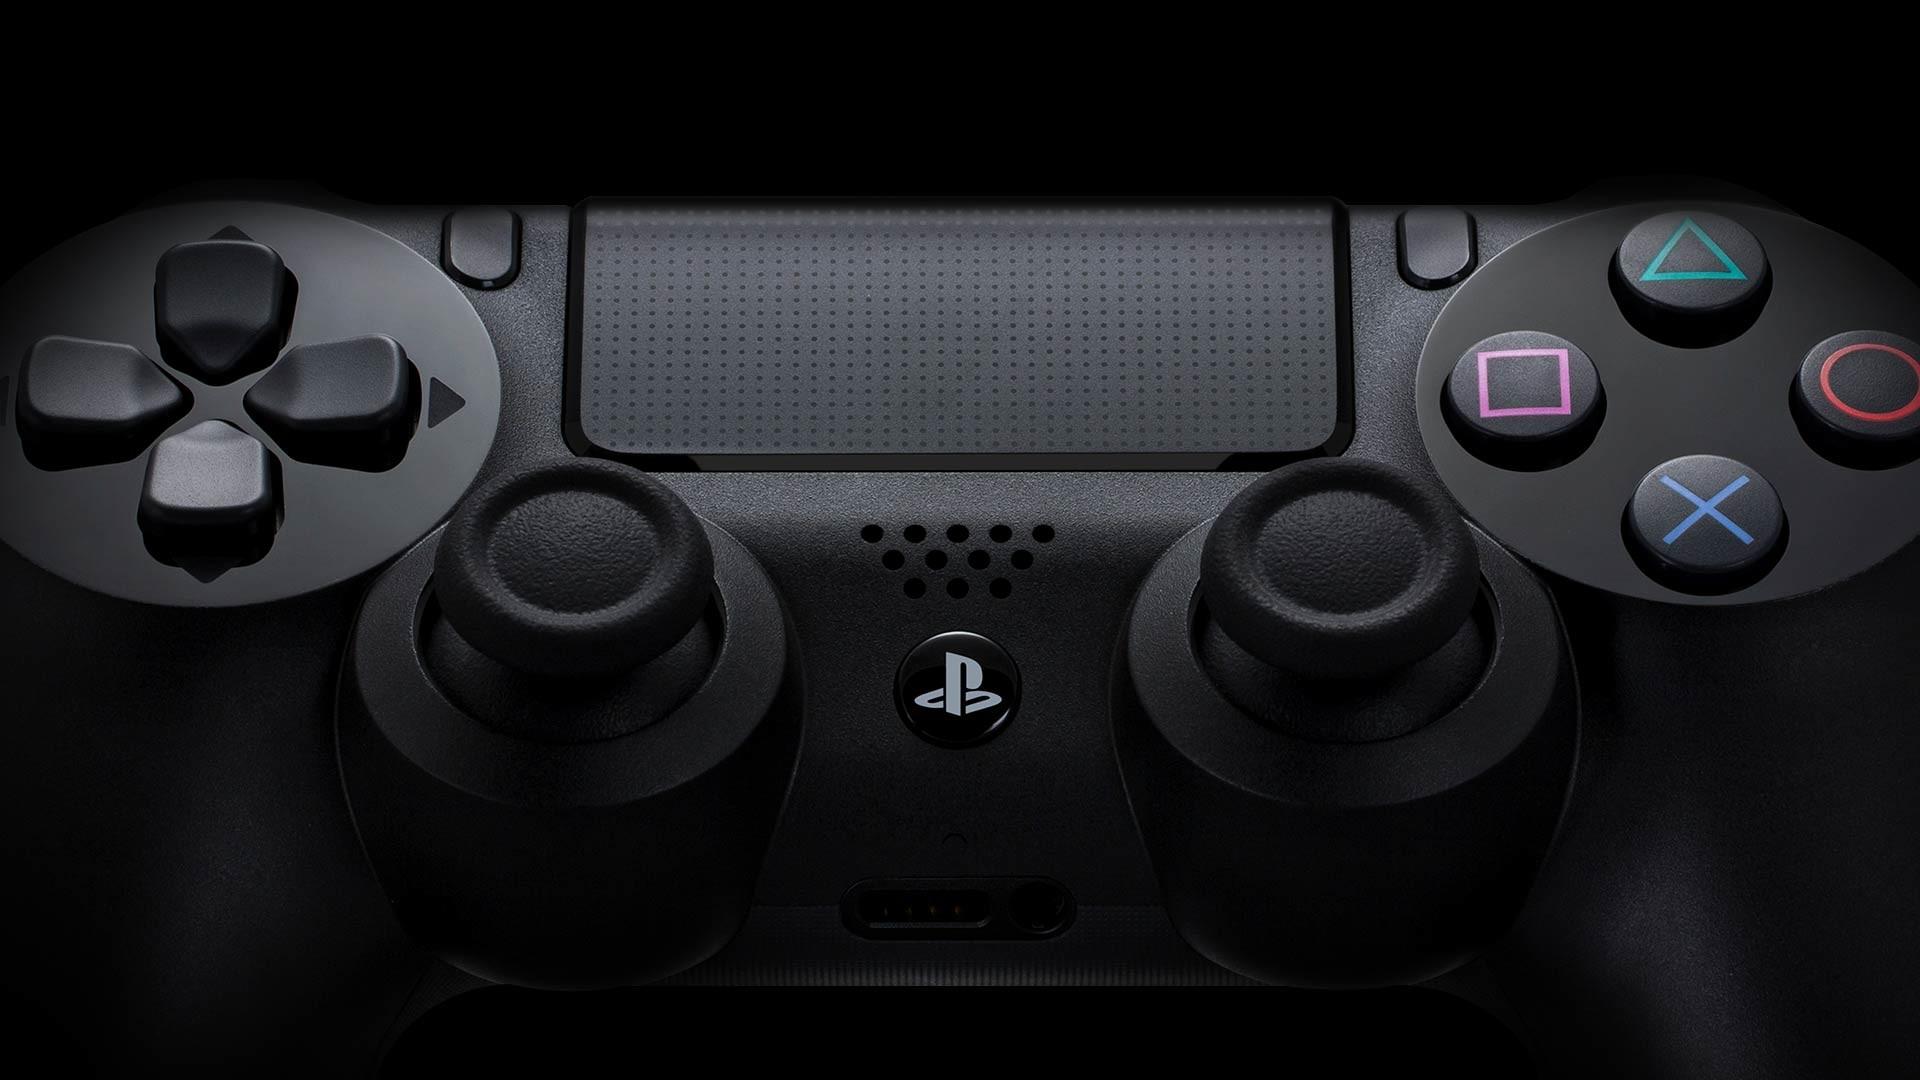 PS4 Controller Up Close Wallpaper 50374